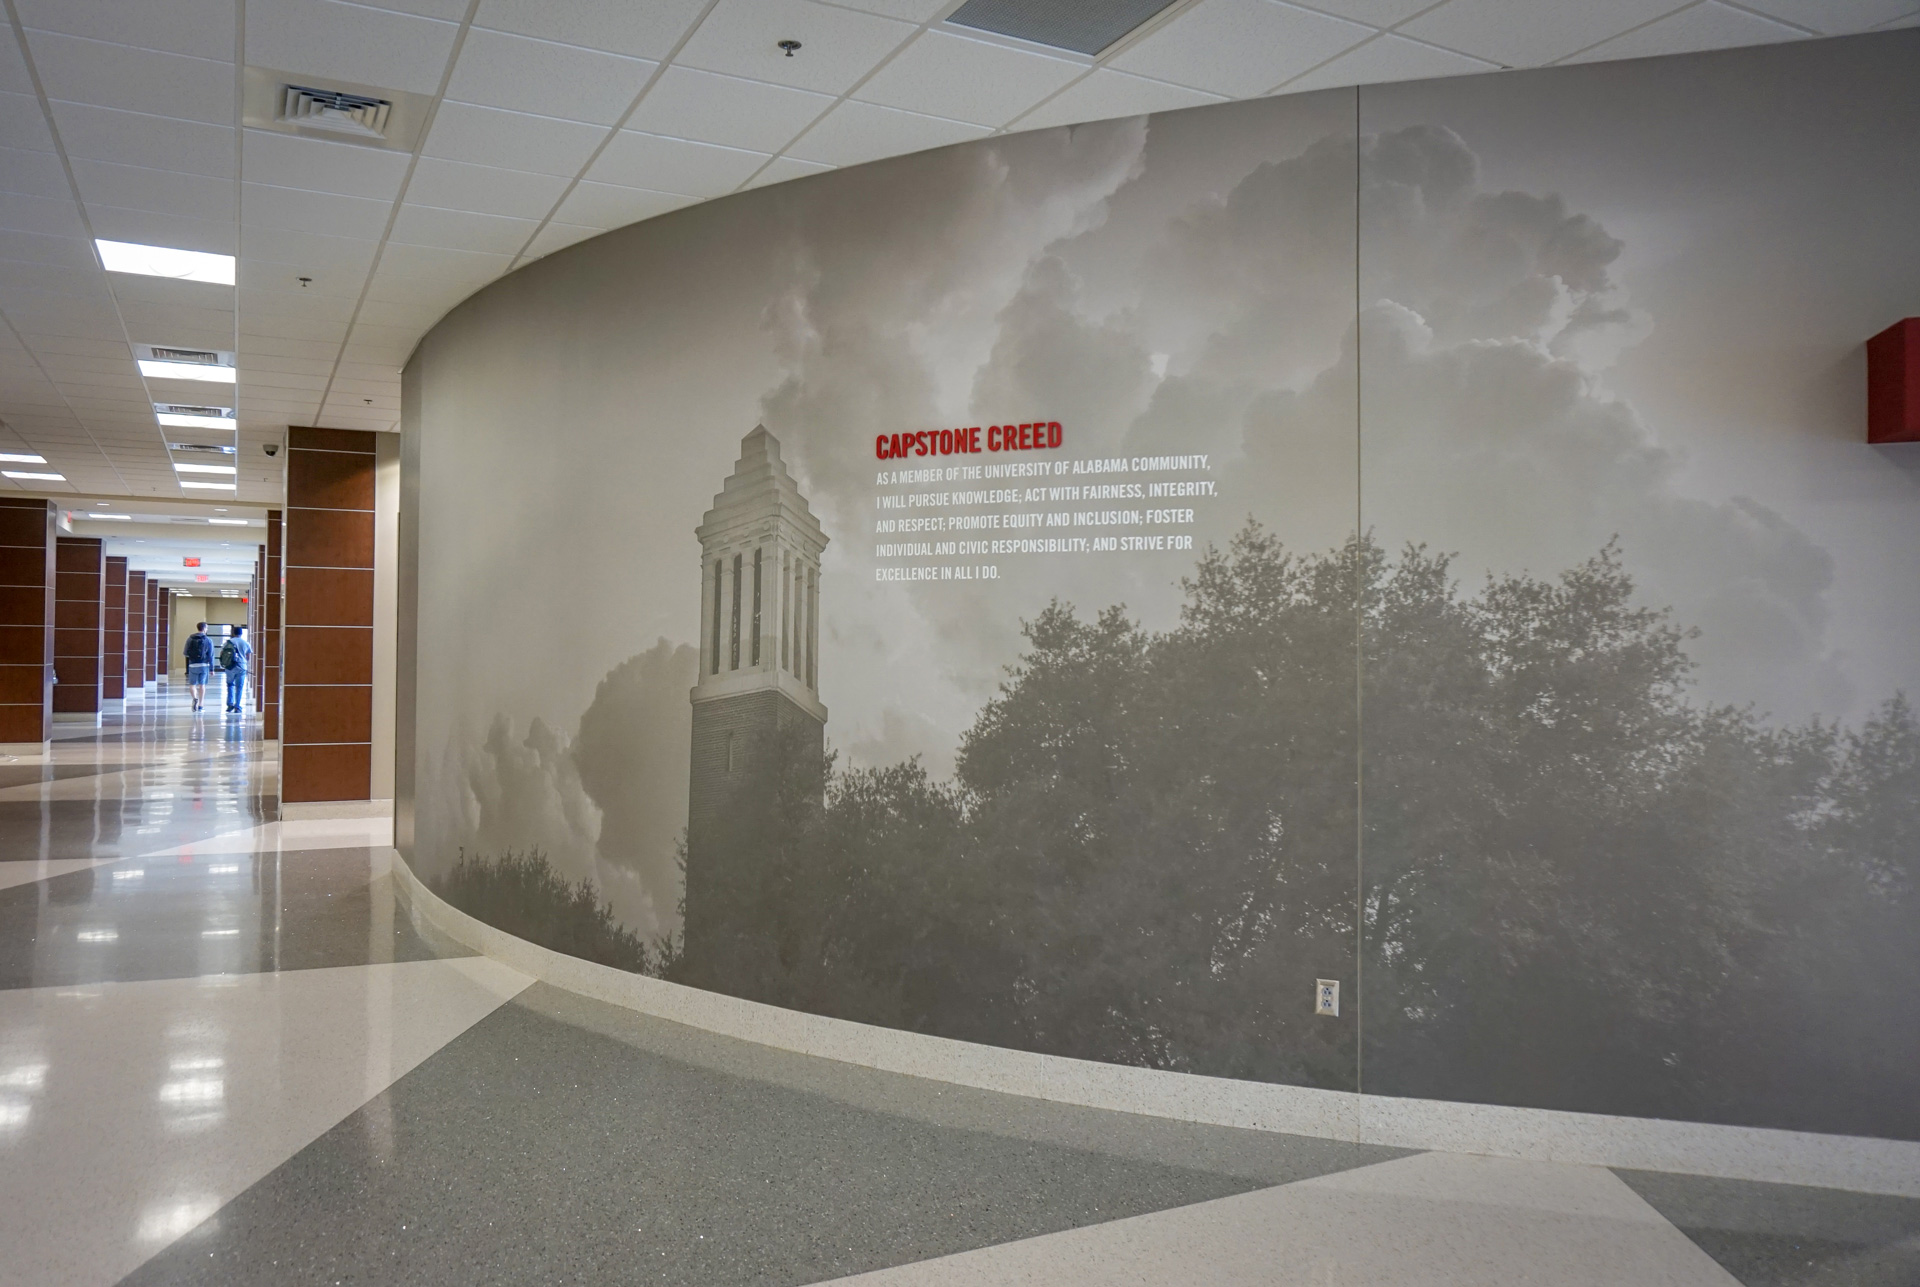 Capstone Creed wall graphic in Ferguson Hall